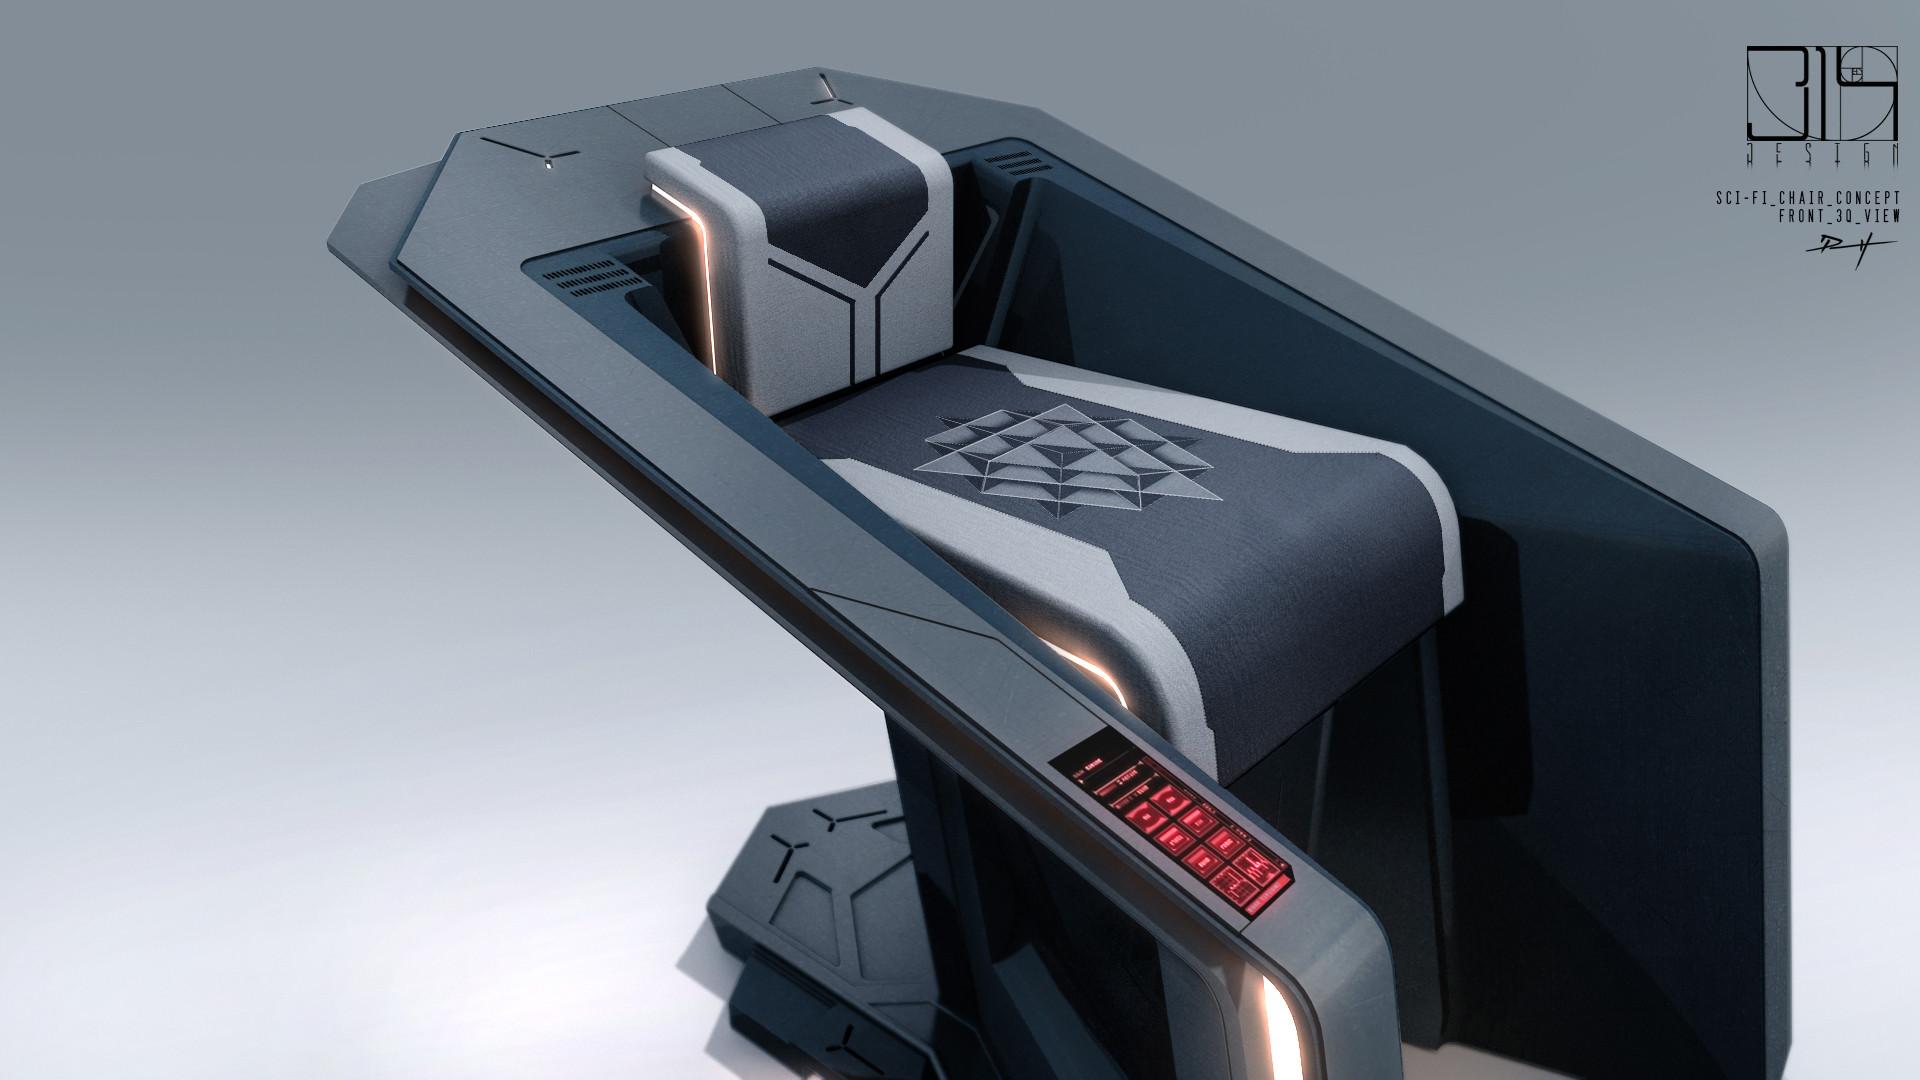 Artstation - Sci-fi Apartment Battle Command Table